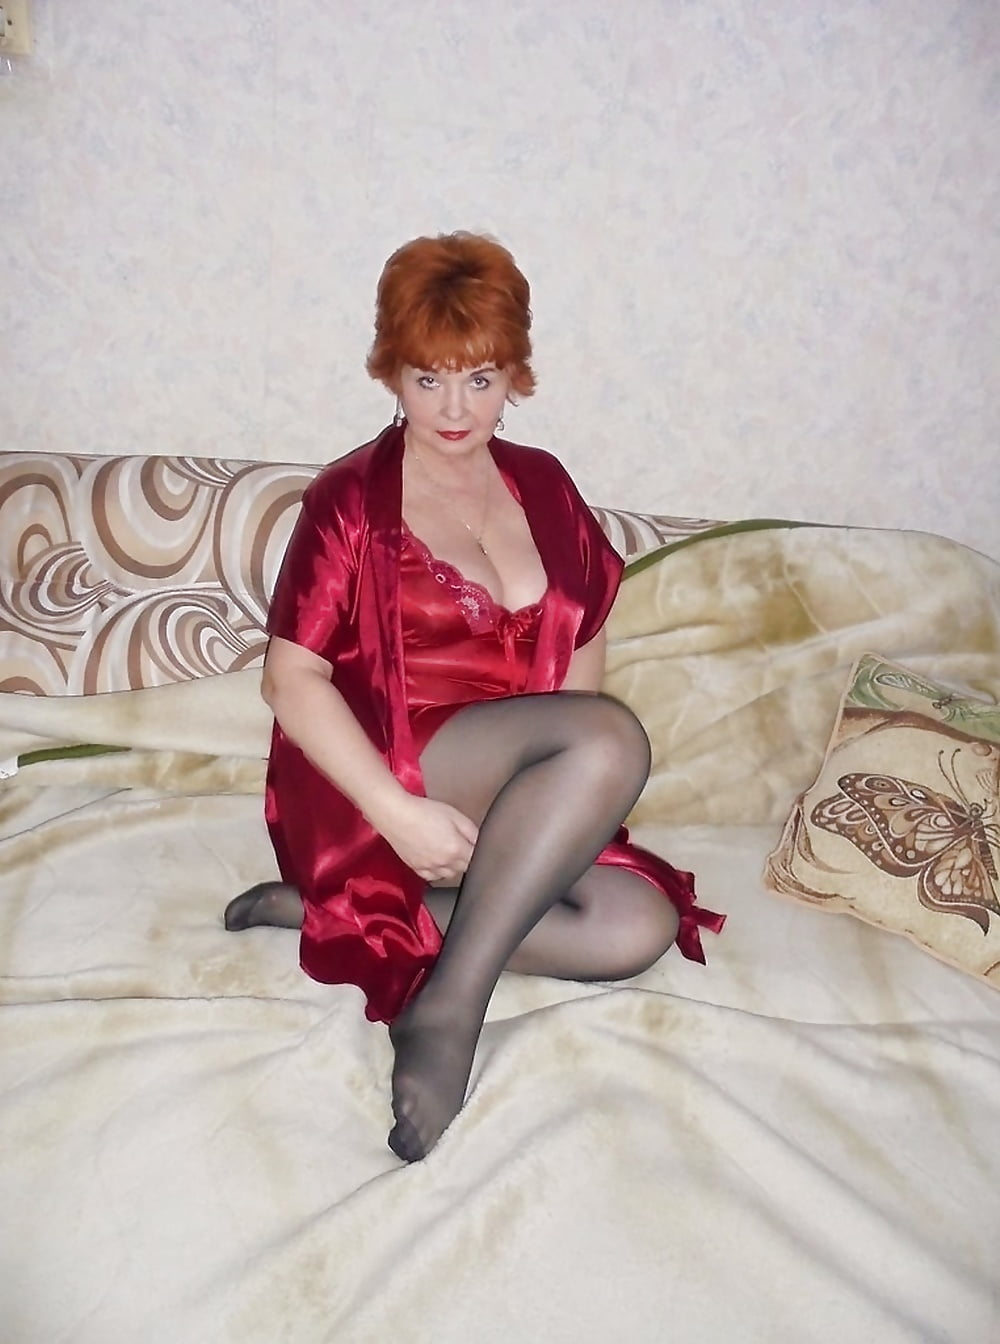 seks-zrelih-zhenshin-fotoalbomi-krasivaya-staraya-golaya-zhenshina